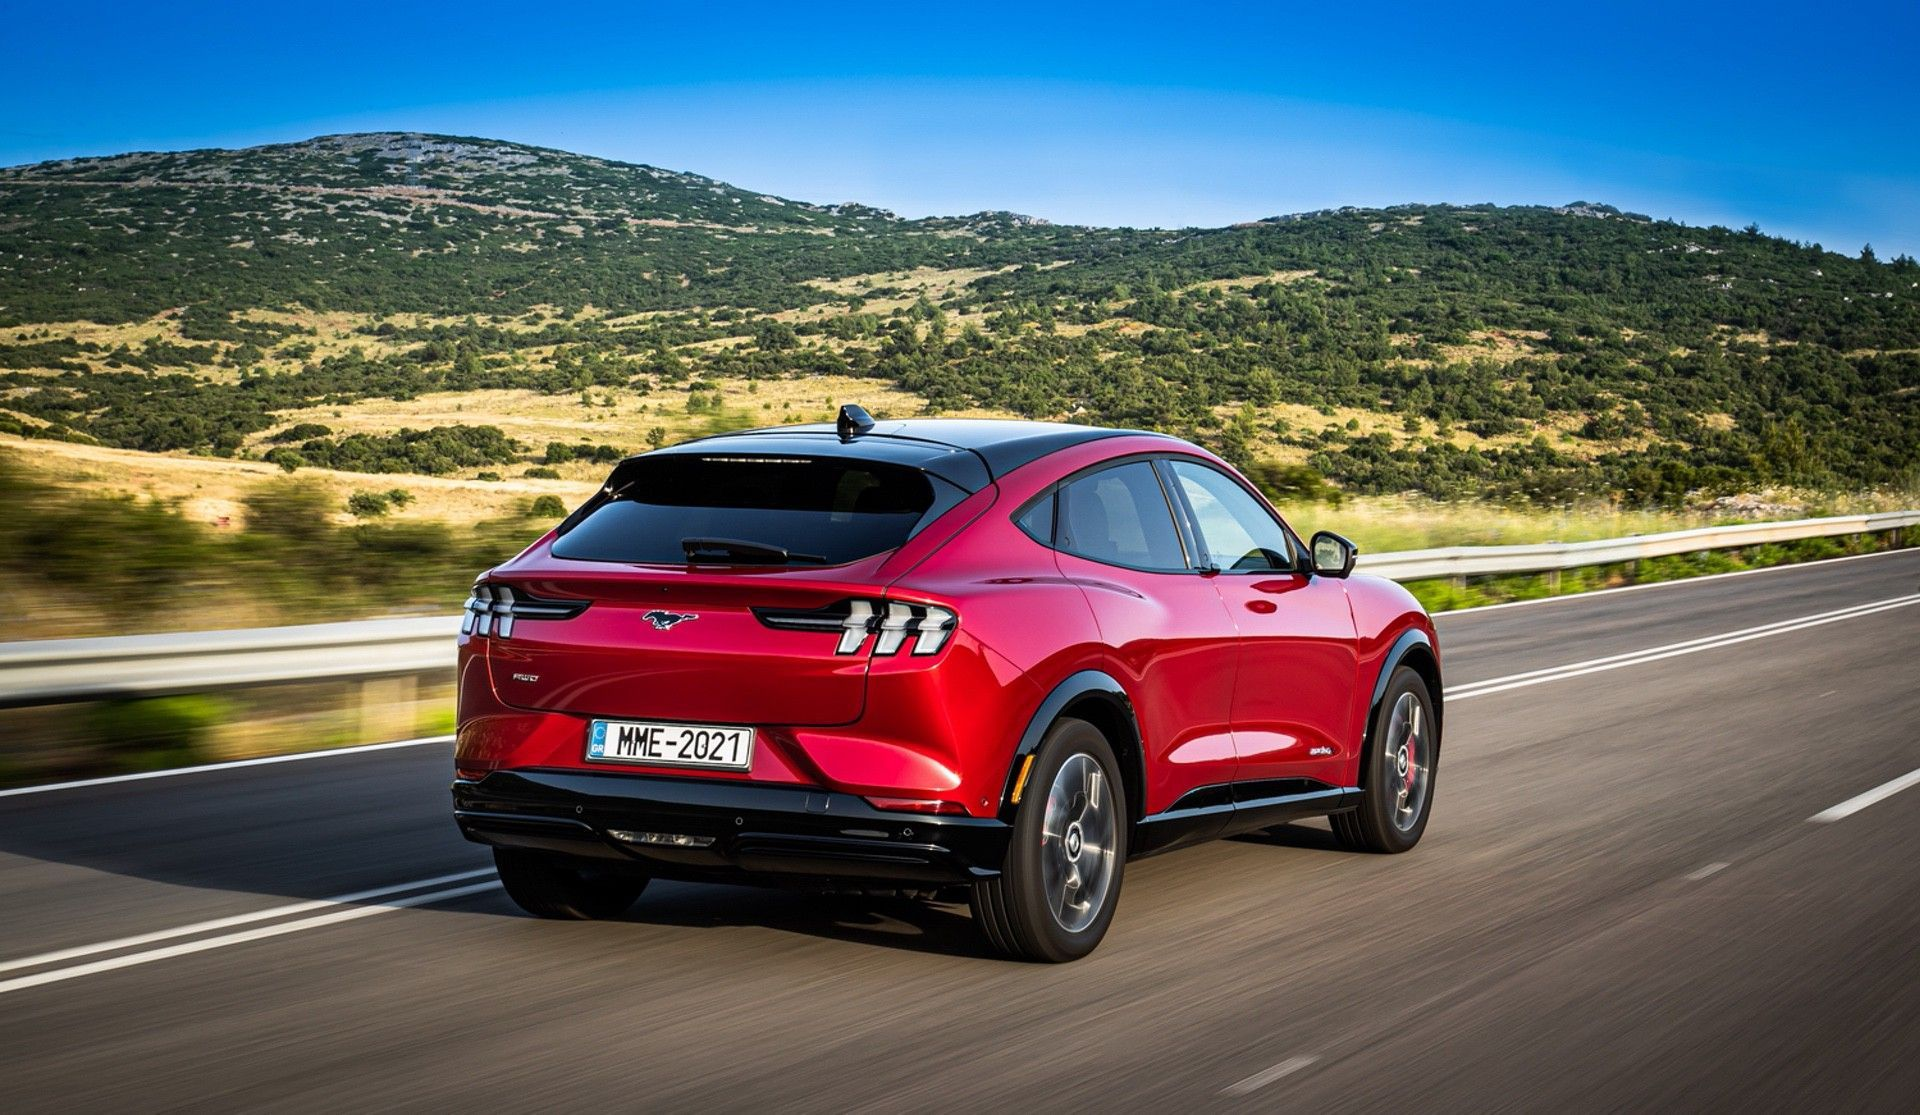 Ford_Mustang_Mach-E_greek_presskit-0122